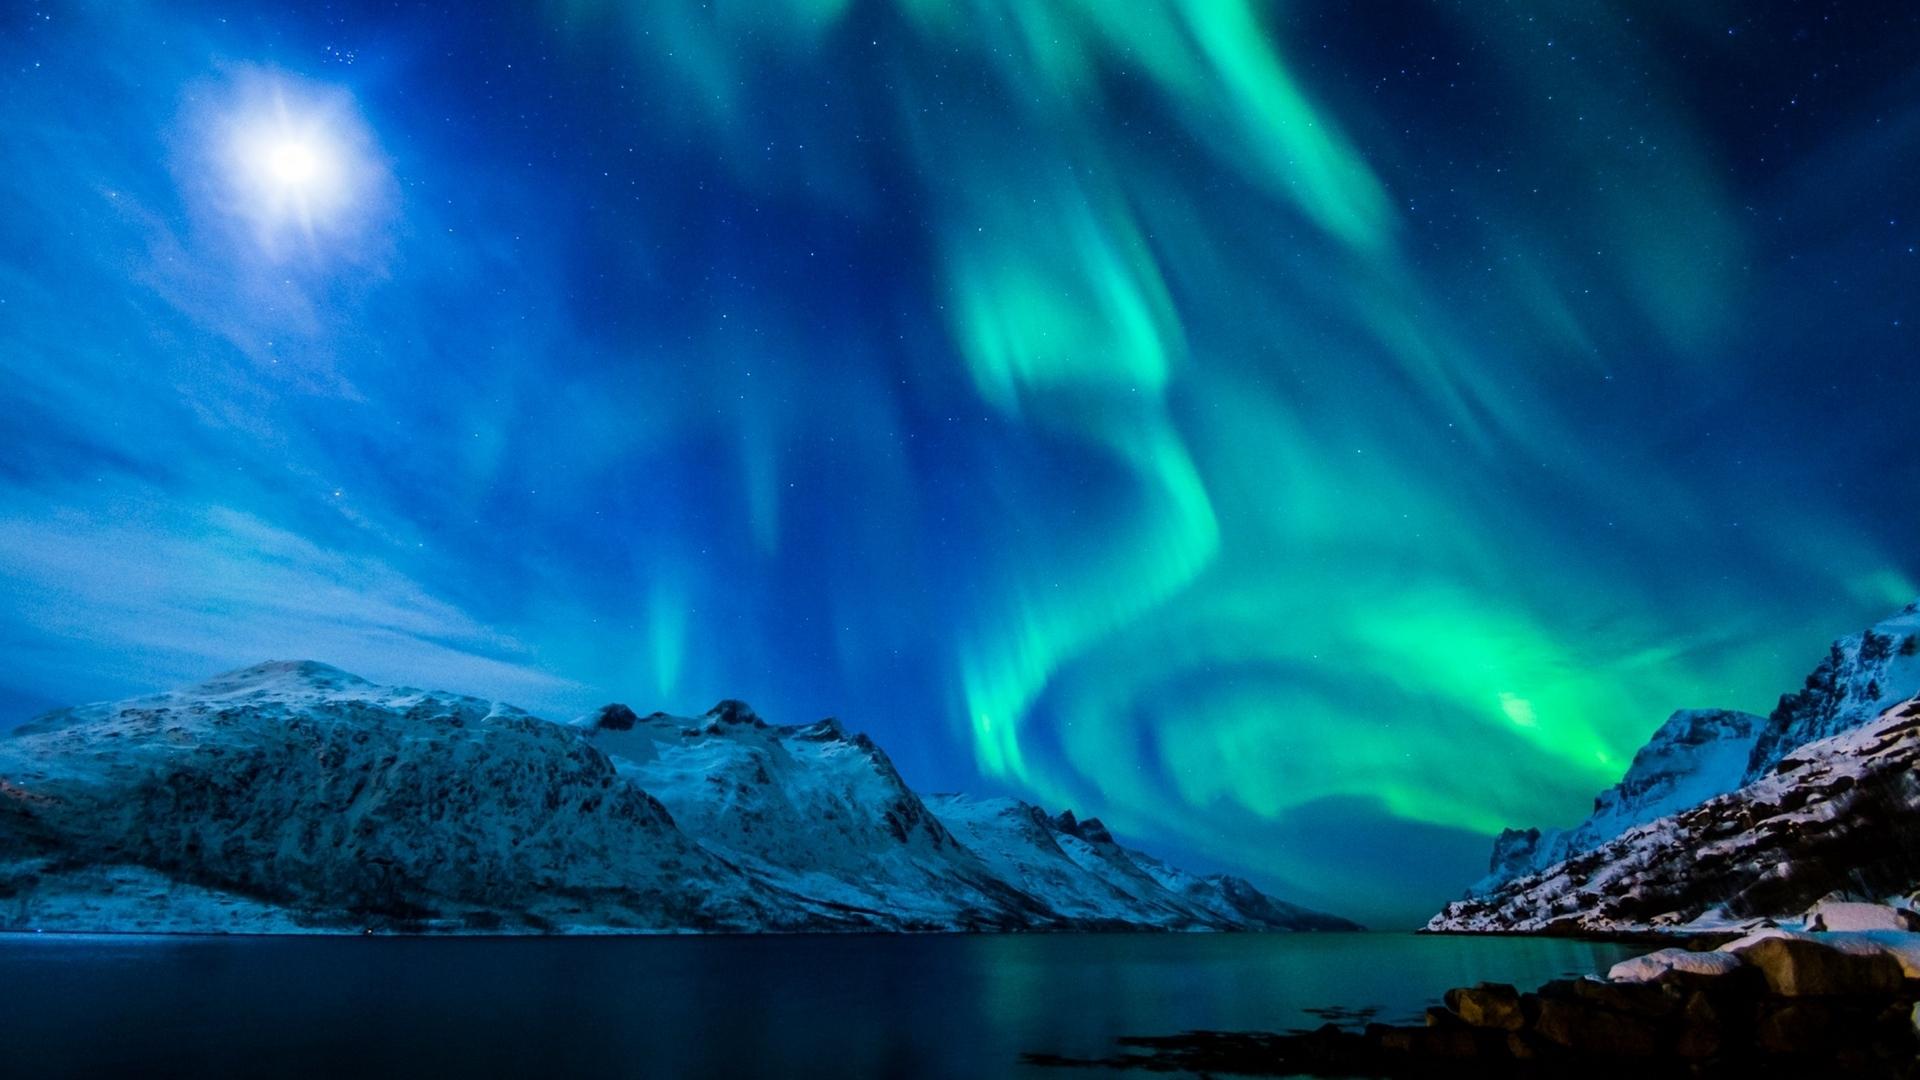 download wallpaper 1920x1080 northern lights, aurora borealis, uk